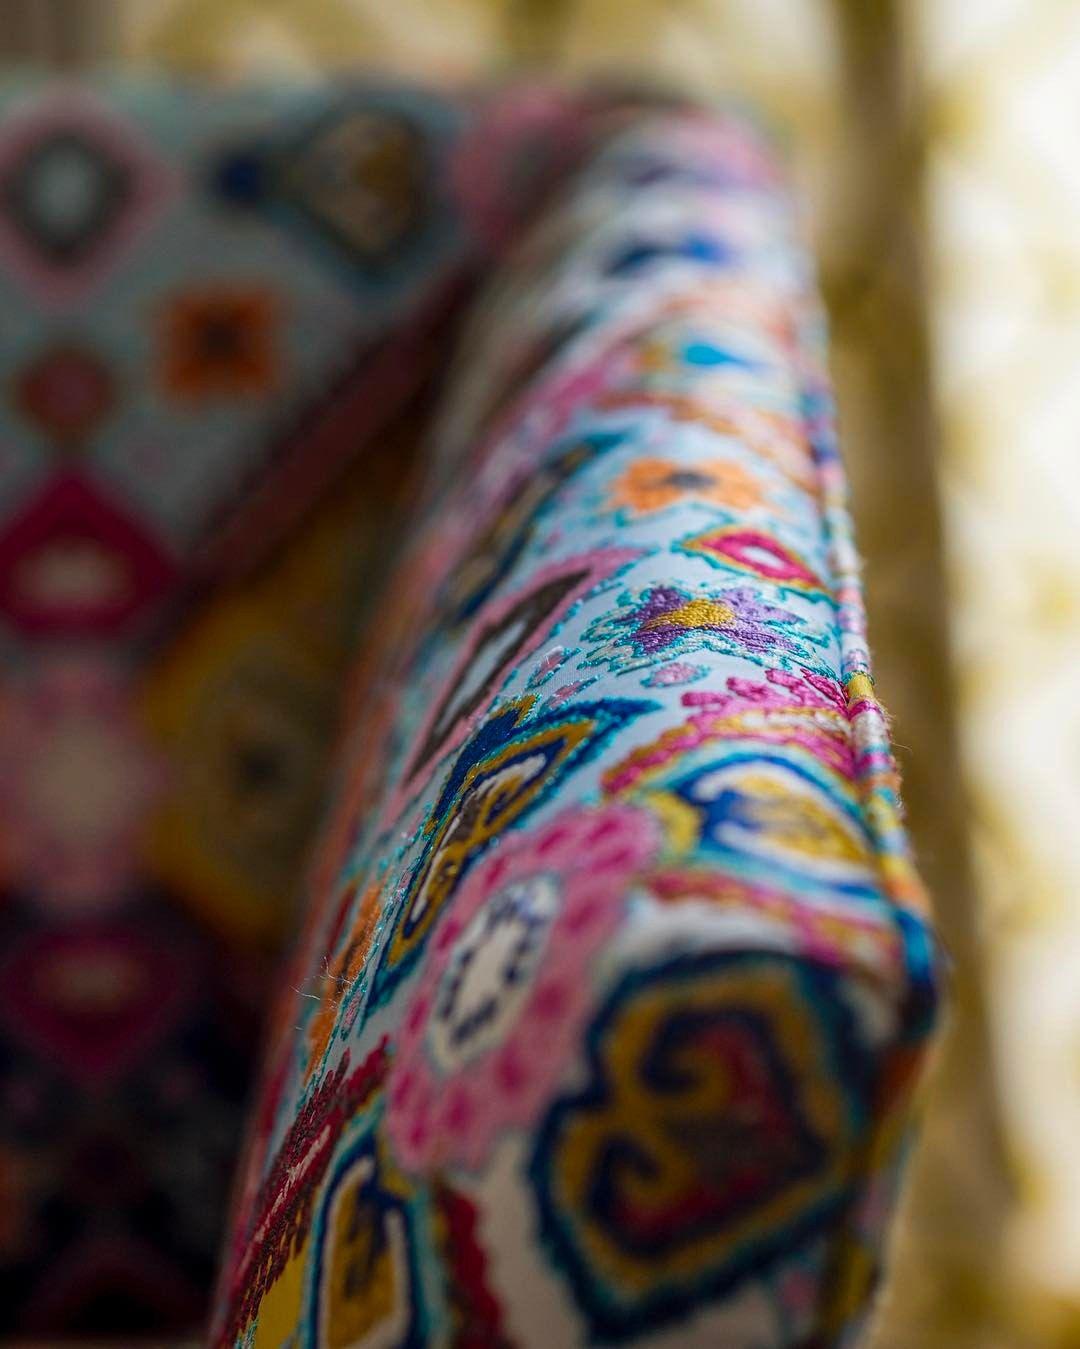 "335 vind-ik-leuks, 8 reacties - La Maison Pierre Frey (@lamaisonpierrefrey) op Instagram: '""Maoming"" embroidery on a ""Dimitri"" sofa ! #love #interior #homedecor #beautiful #embroidery'"